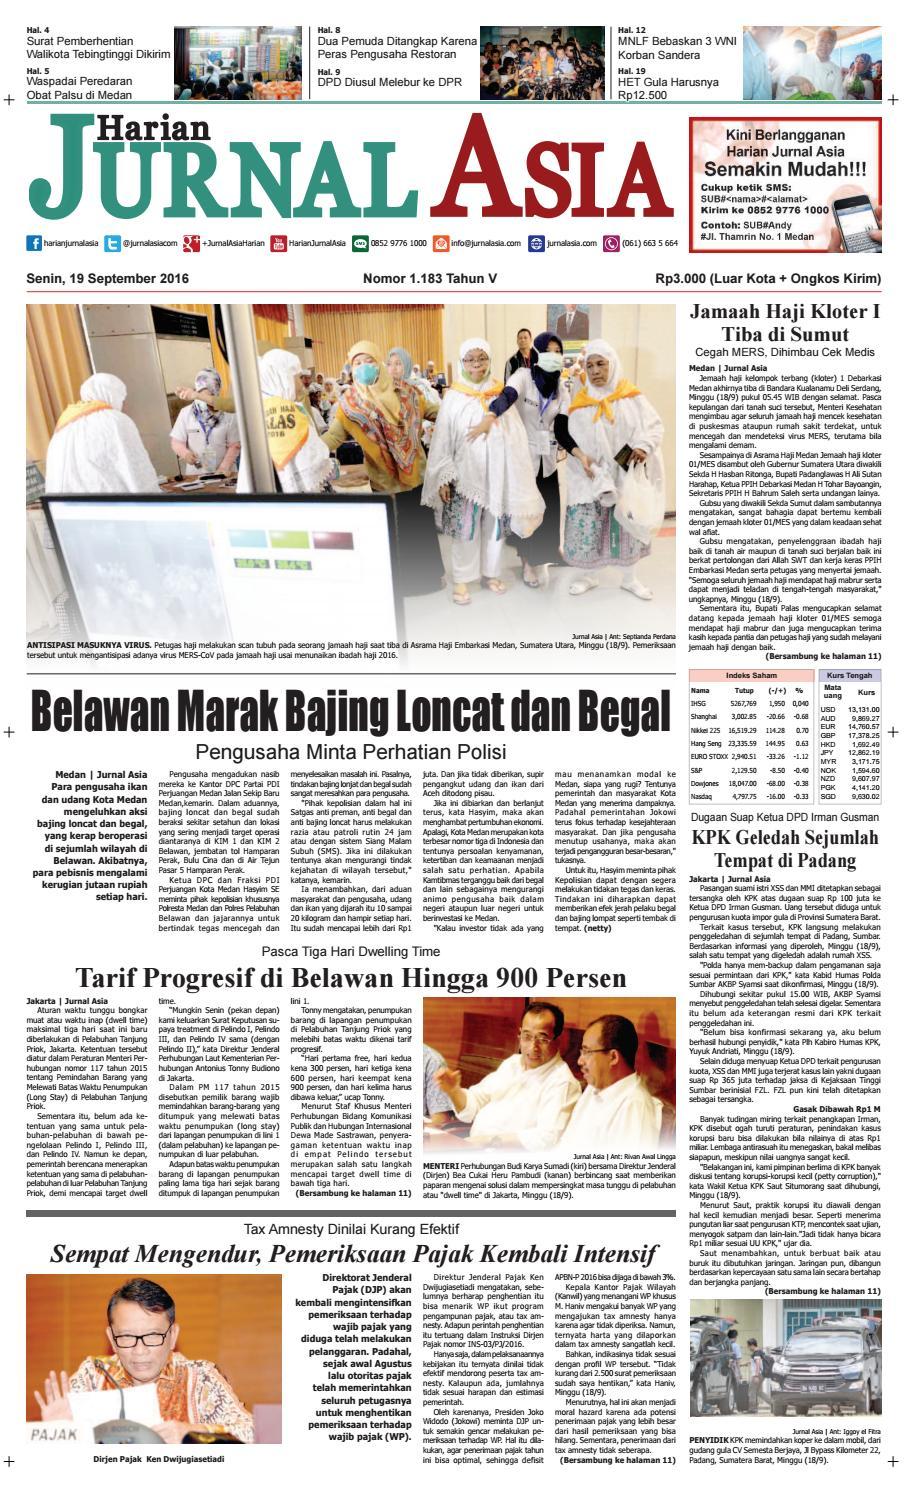 Harian Jurnal Asia Edisi Senin 19 September 2016 By Produk Ukm Bumn Philips Essential 18w Medan Issuu